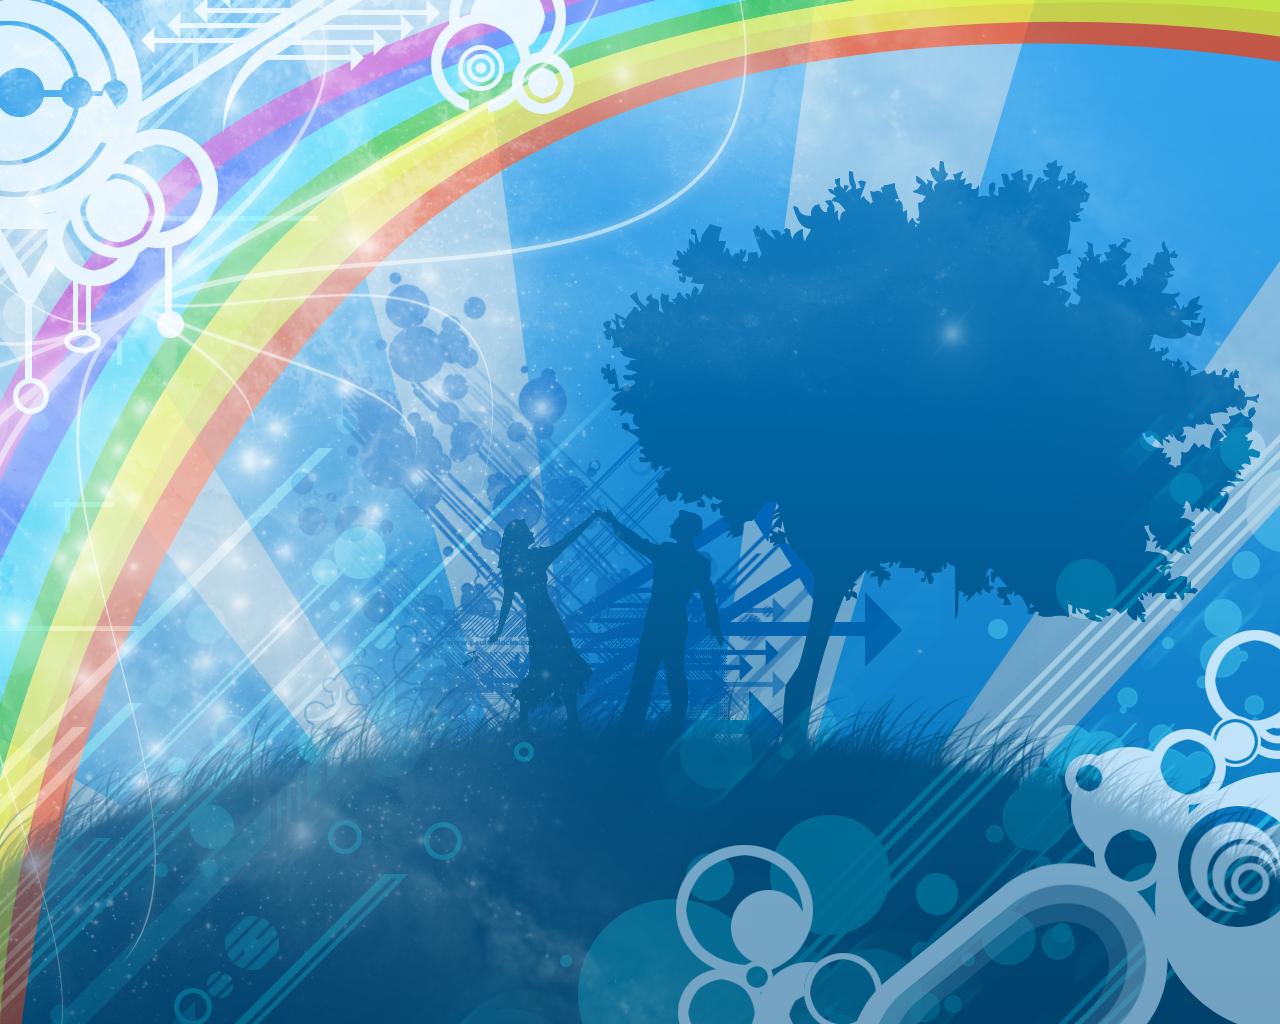 http://4.bp.blogspot.com/_sNHW8OVGeAs/TTHFIBsZ6mI/AAAAAAAAADs/CFejEWrY8C8/s1600/Vector_wallpaper_by_tfcian.jpg